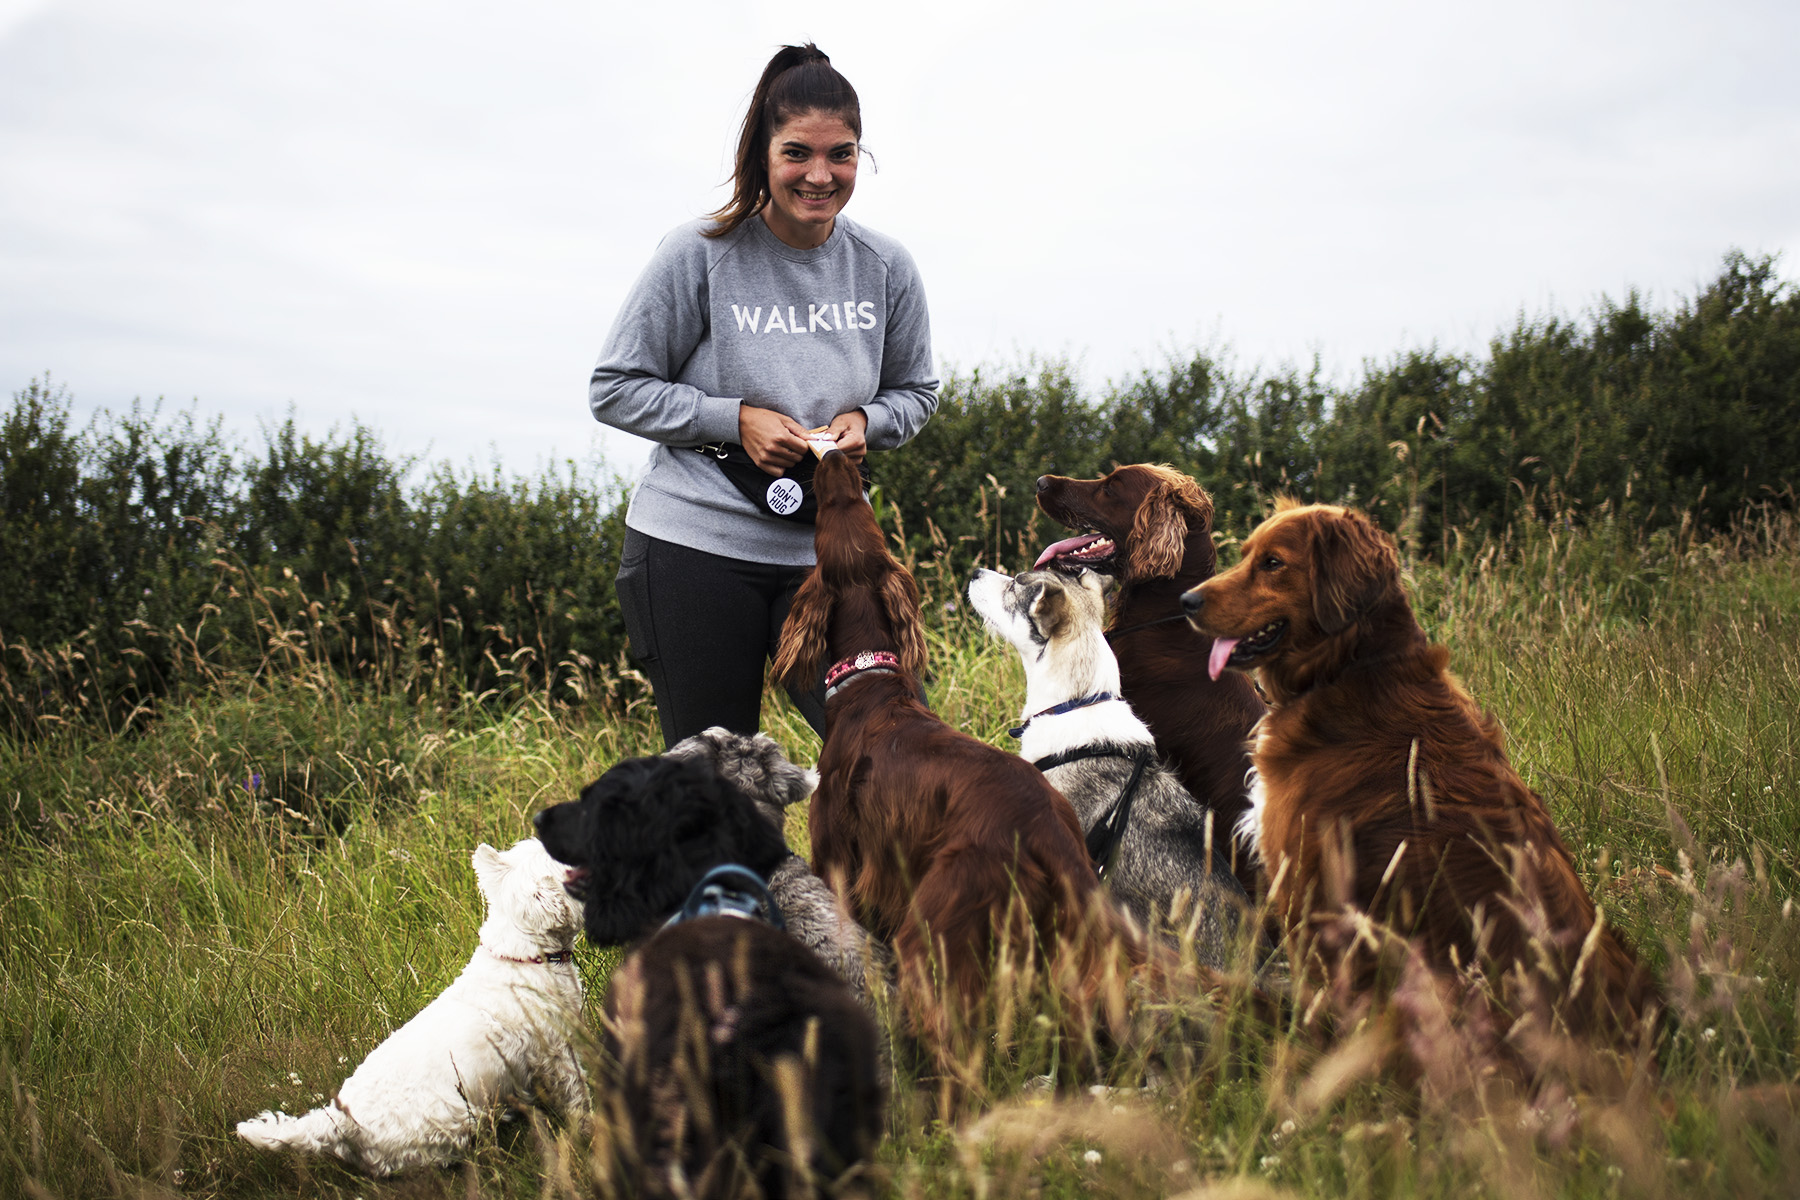 Fran from North Cornwall Dog Walking | The Cornish Dog